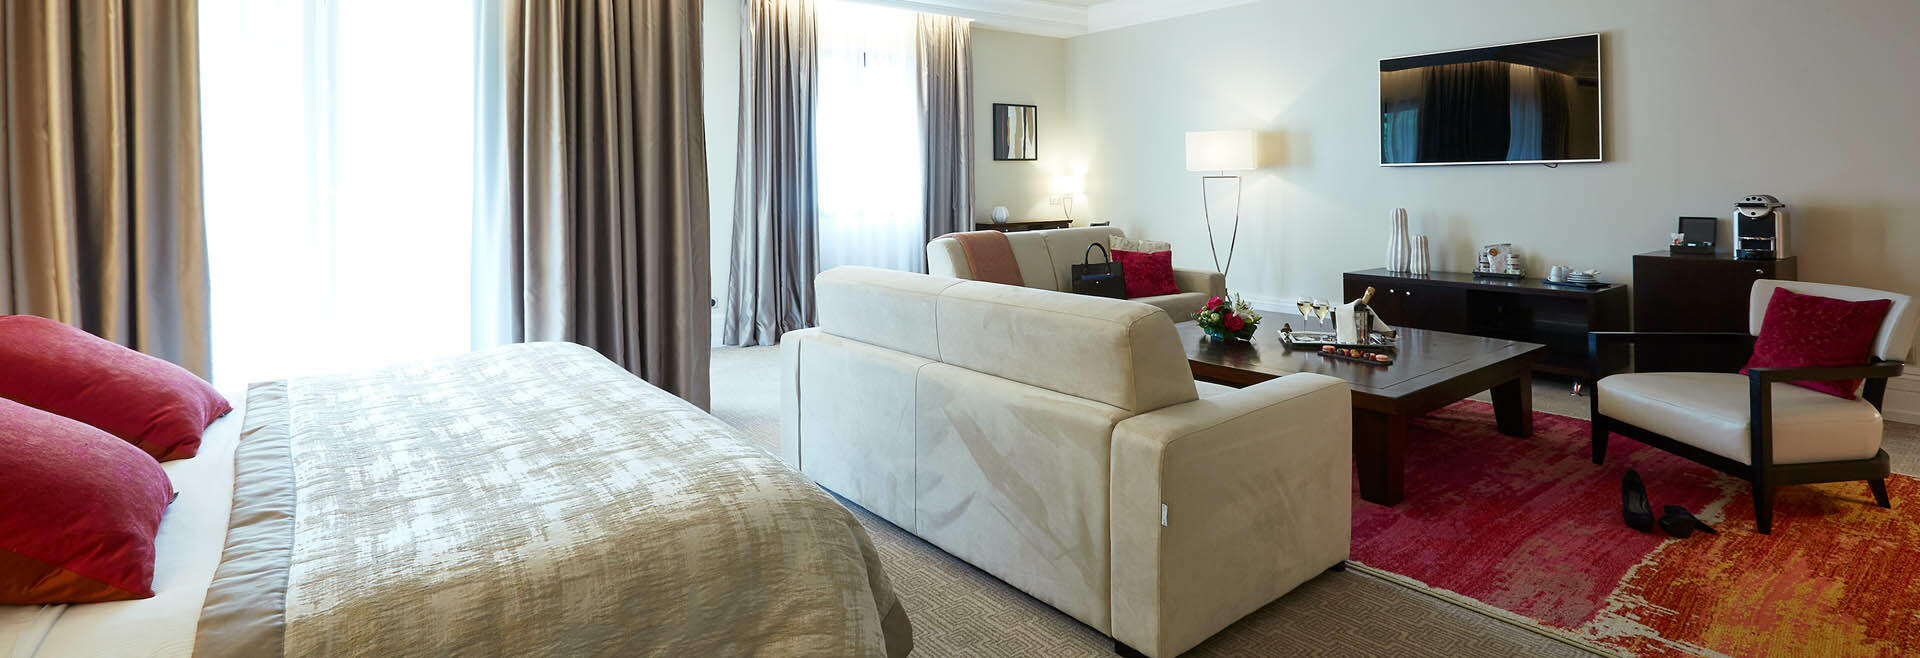 Room at Hotel & Spa Le Pavillon near Lyon